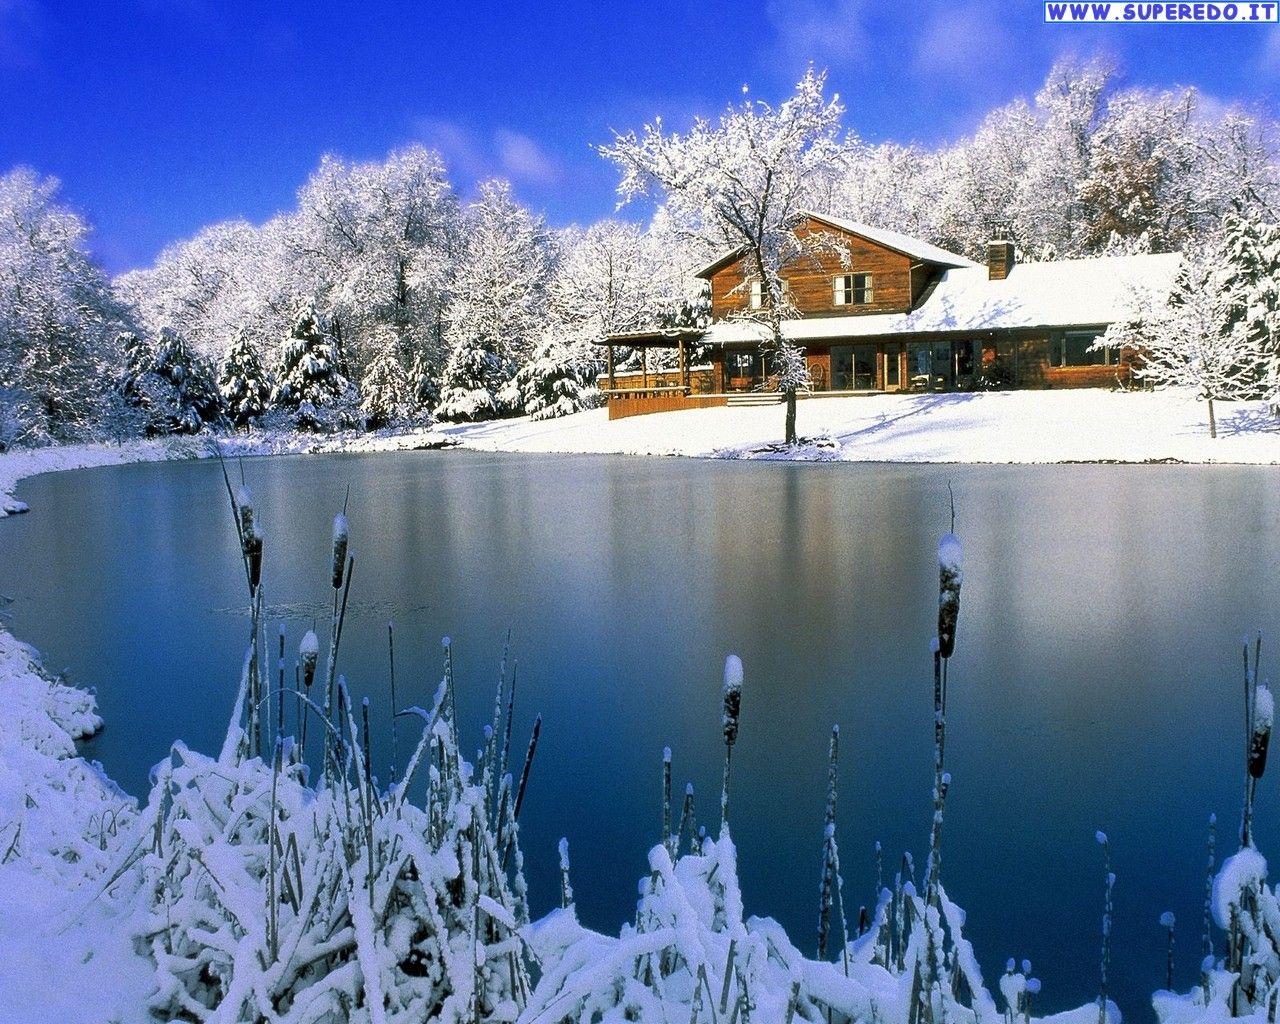 inverno_60.jpg 1.280×1.024 pixel